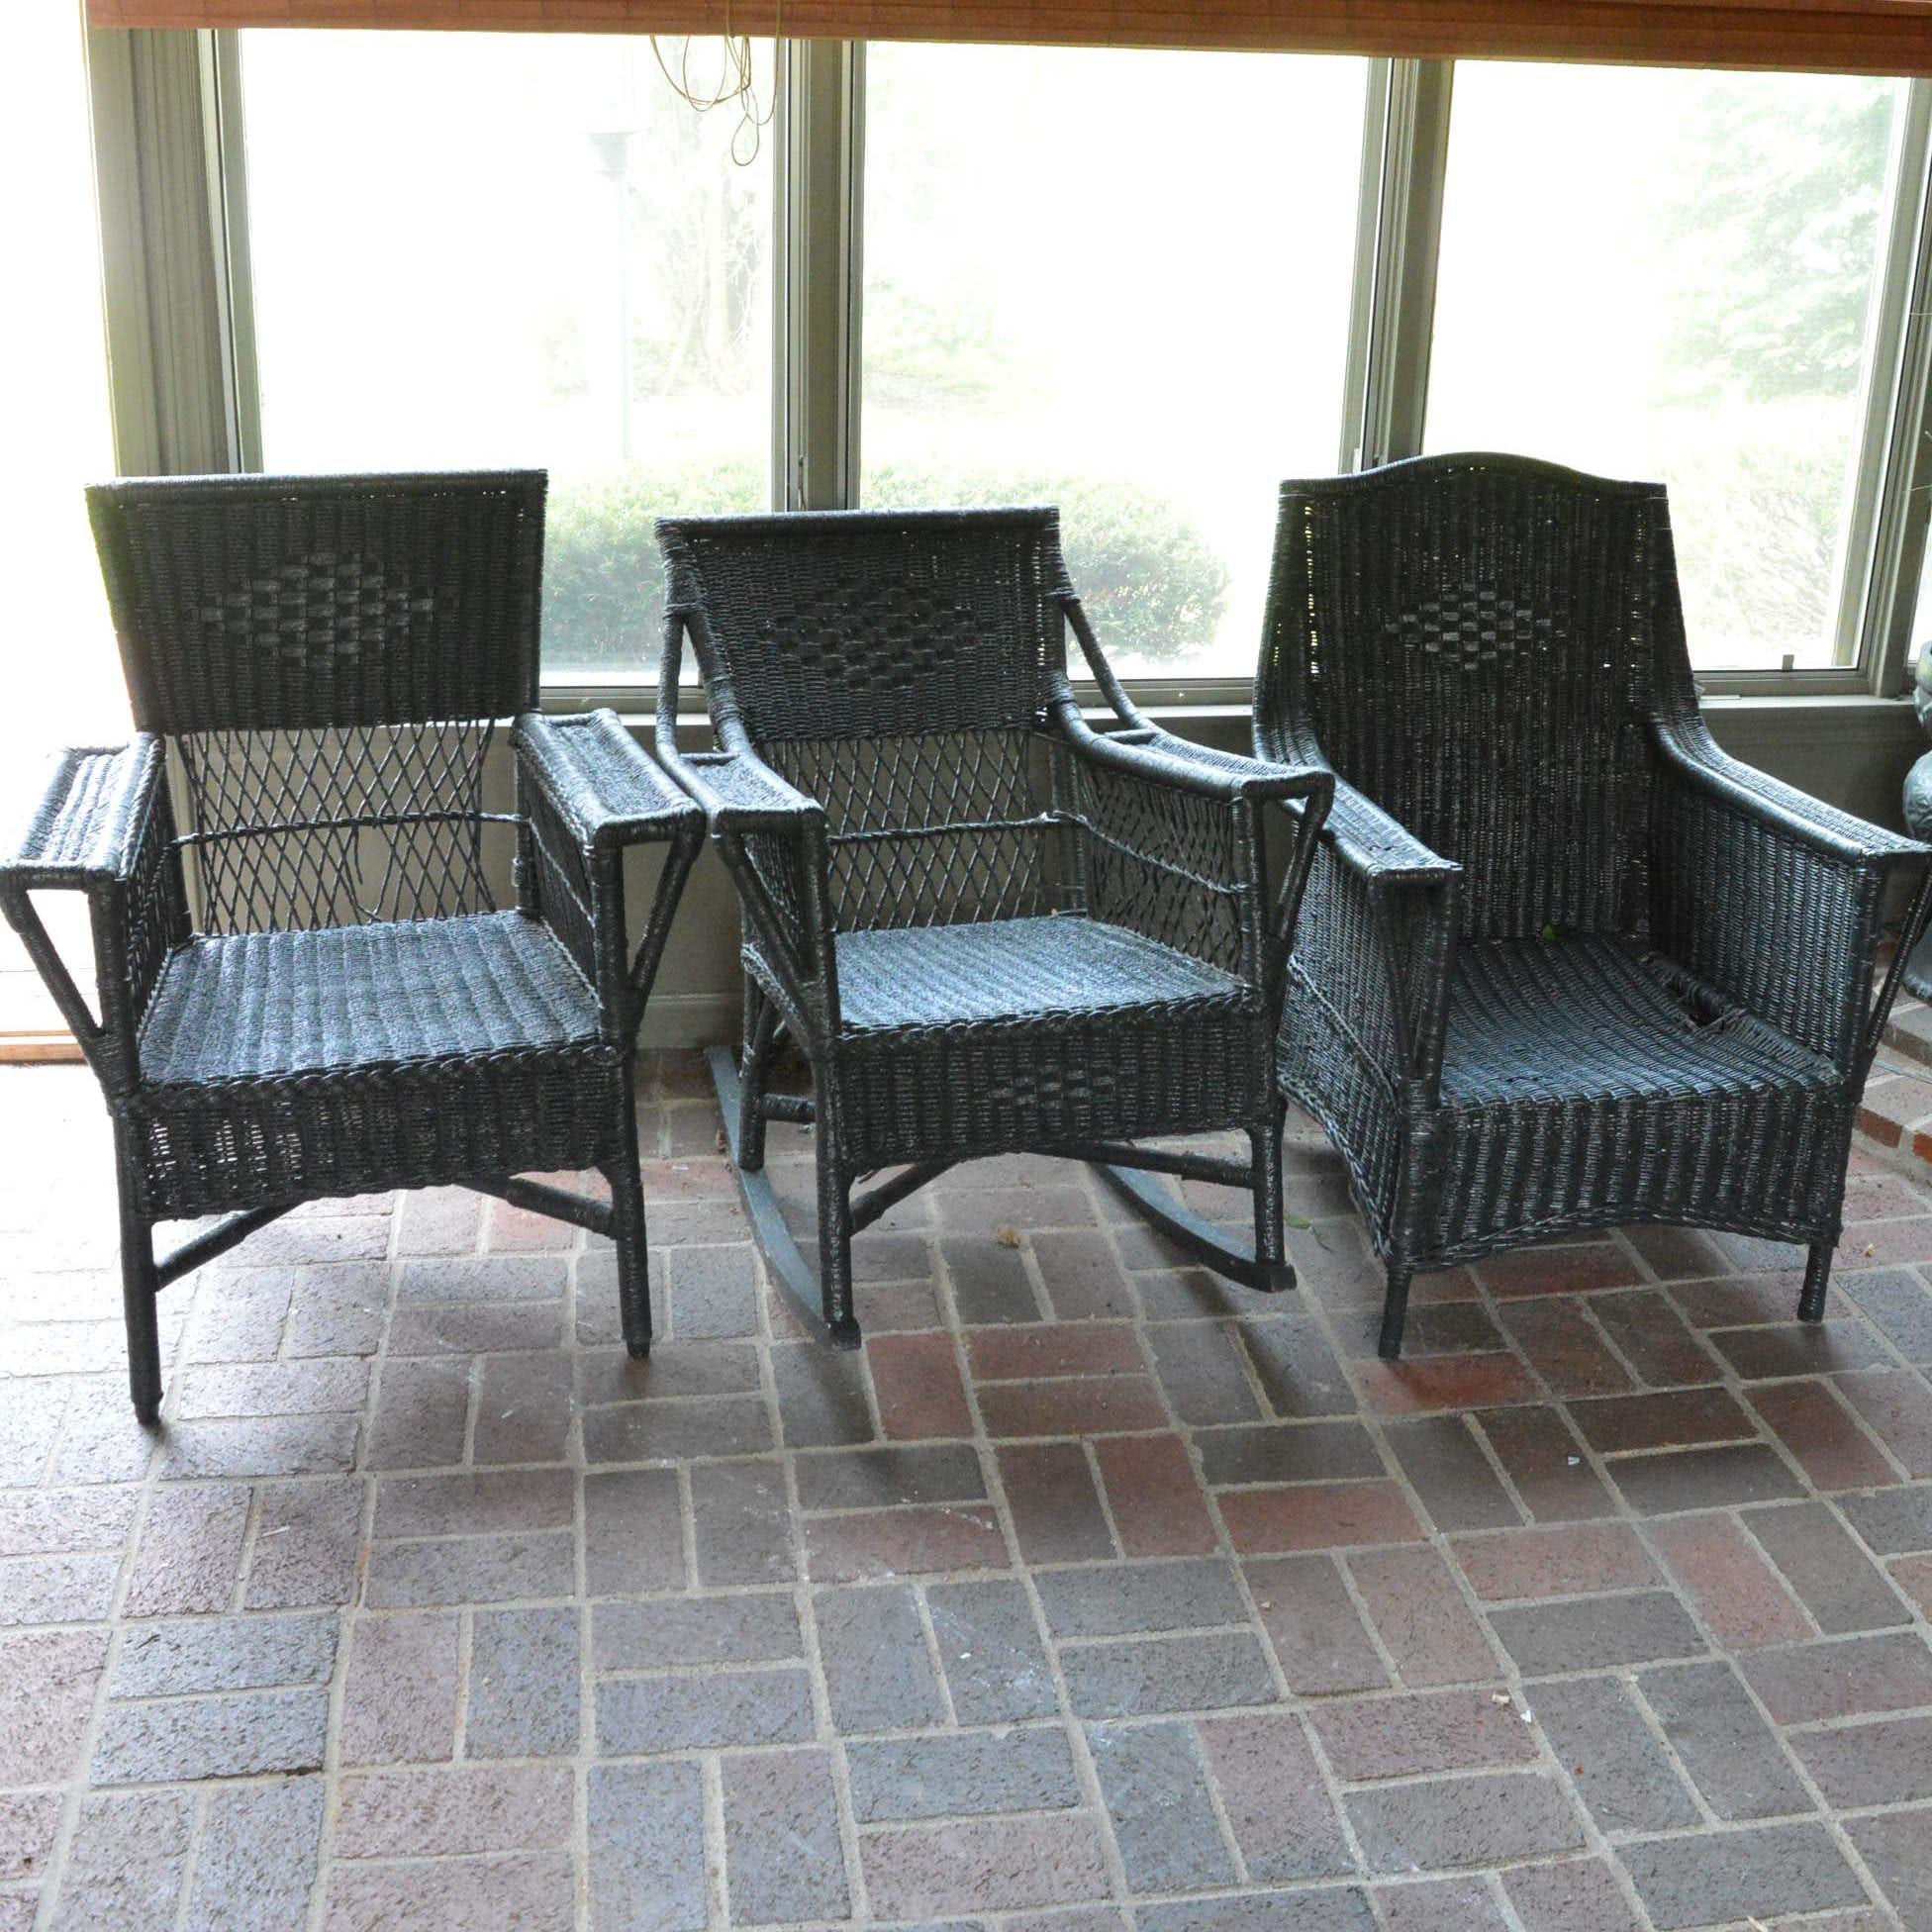 Three Wicker Patio Chairs